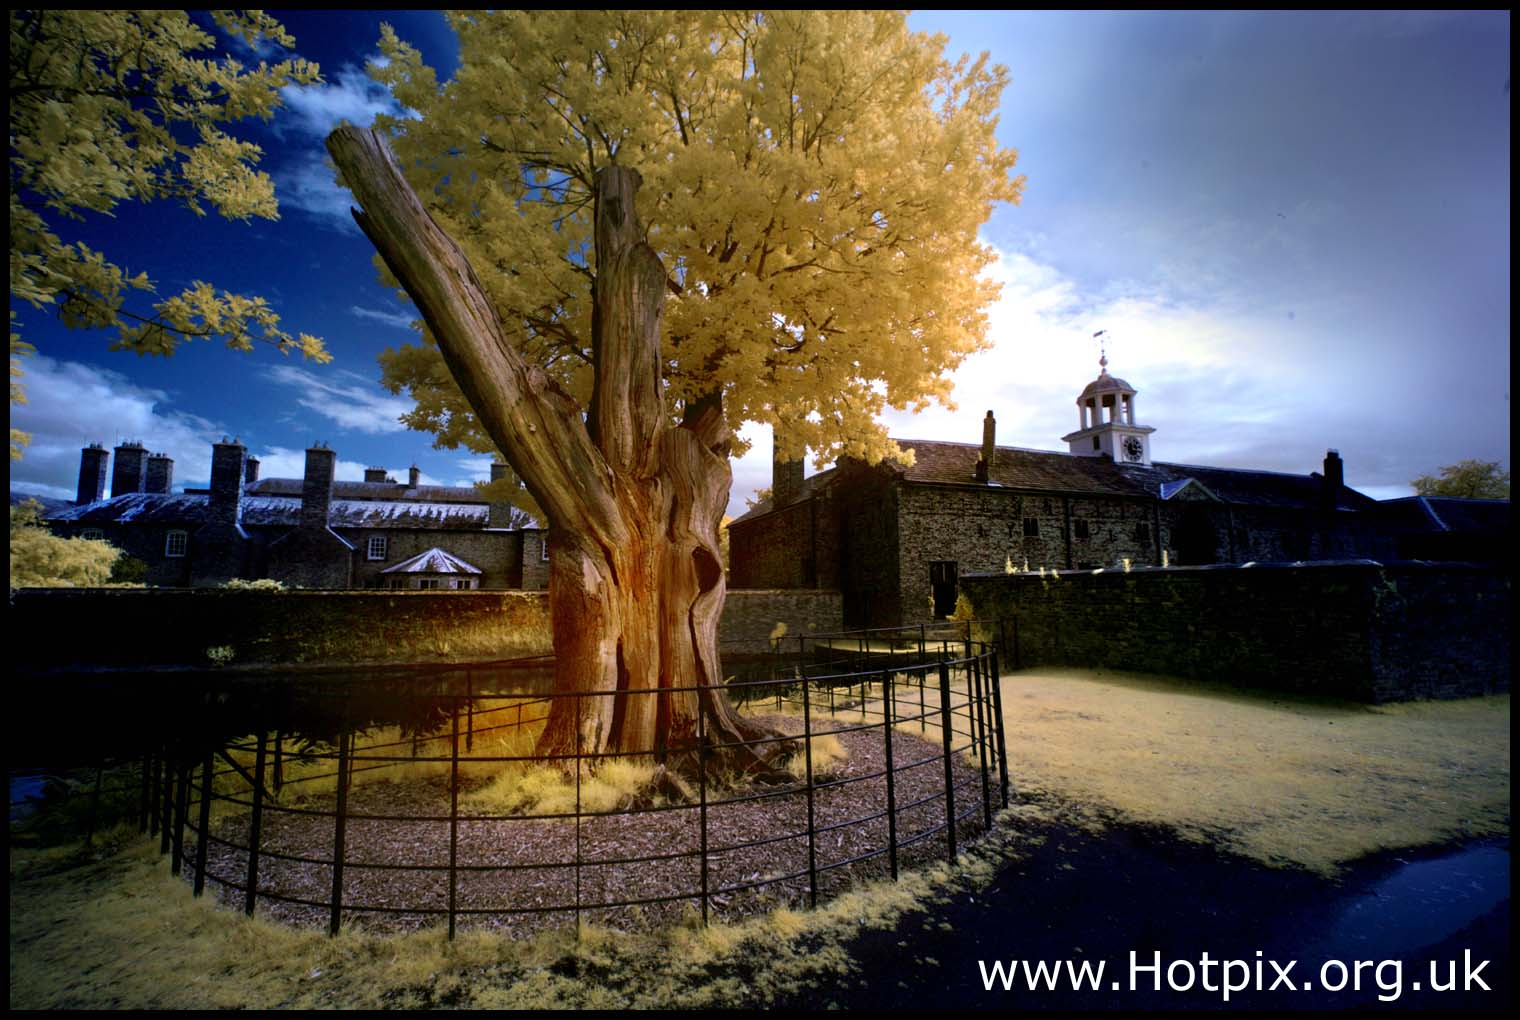 oak,tree,dunham,massey,masey,dunhammassey,NT,national,tust,trust,town,village,property,manchester,altrincham,house,clock,720nm,R72,Hoya,filter,ir,infra,red,infrared,UK,England,britain,tony,smith,tonysmith,hotpix,tonysmithhotpix